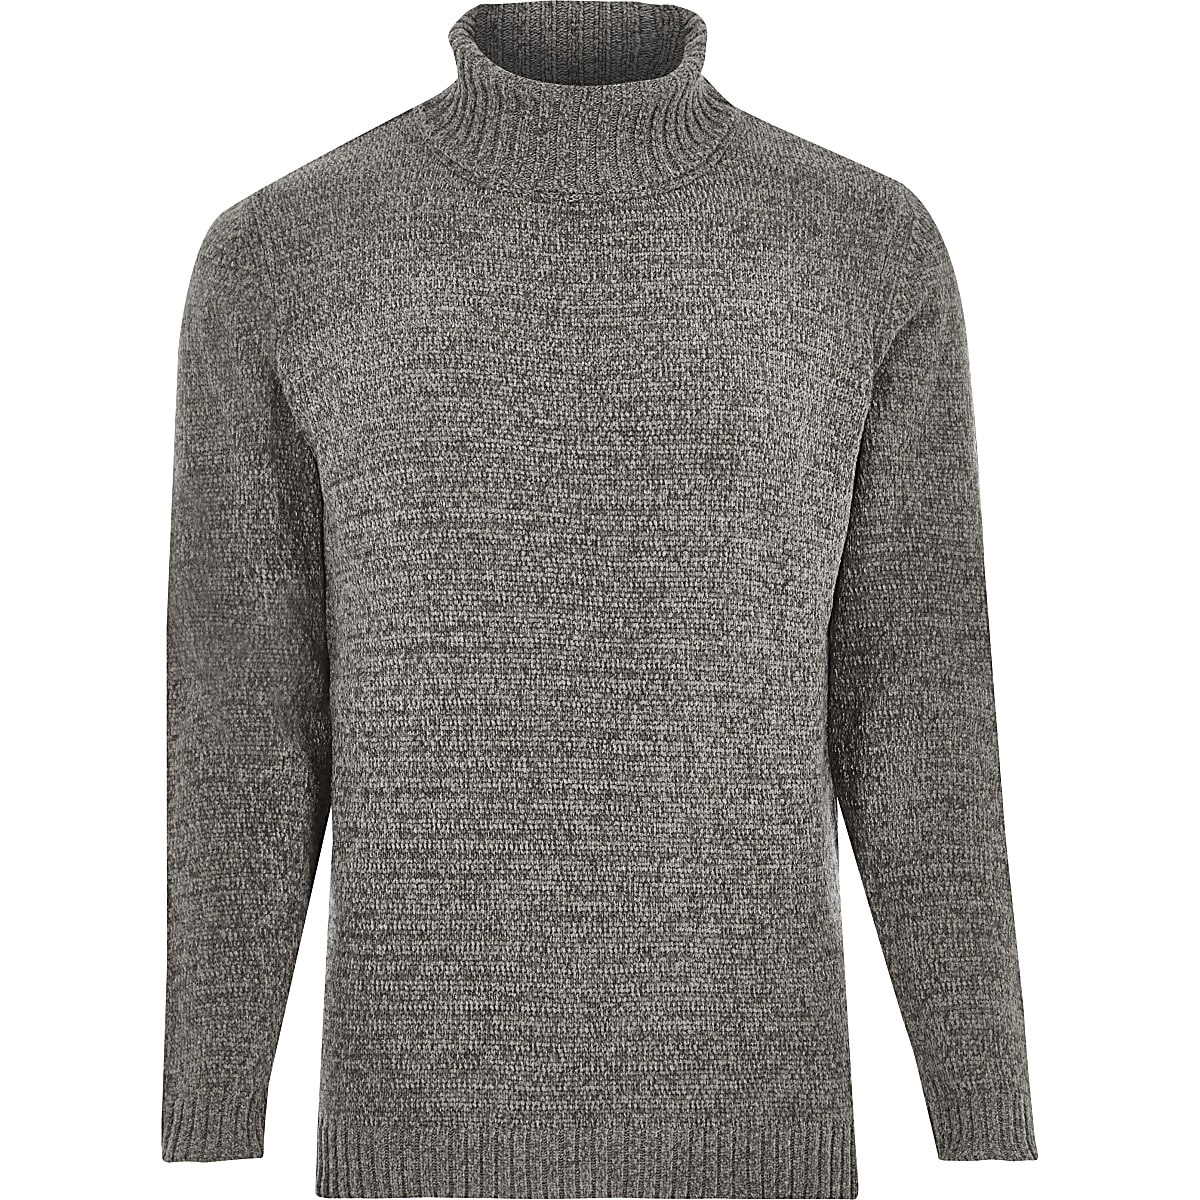 Grey soft roll neck jumper